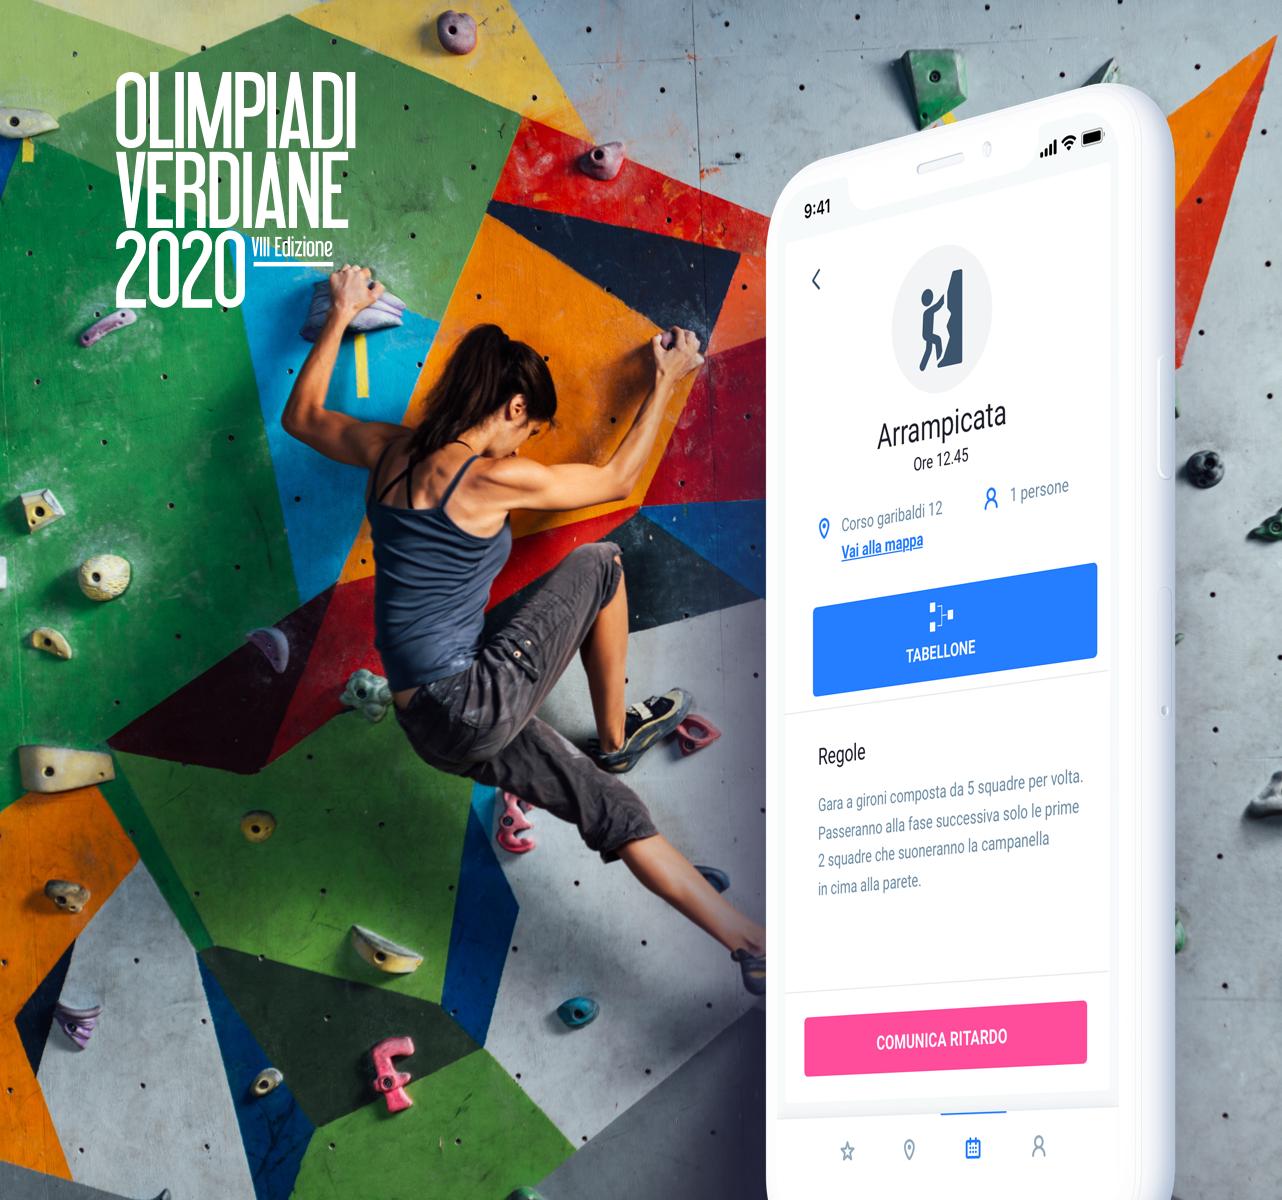 Olimpiadi verdiane- PlaOlimpiadi verdiane- Platform by Carpediem srltform by Carpediem srl